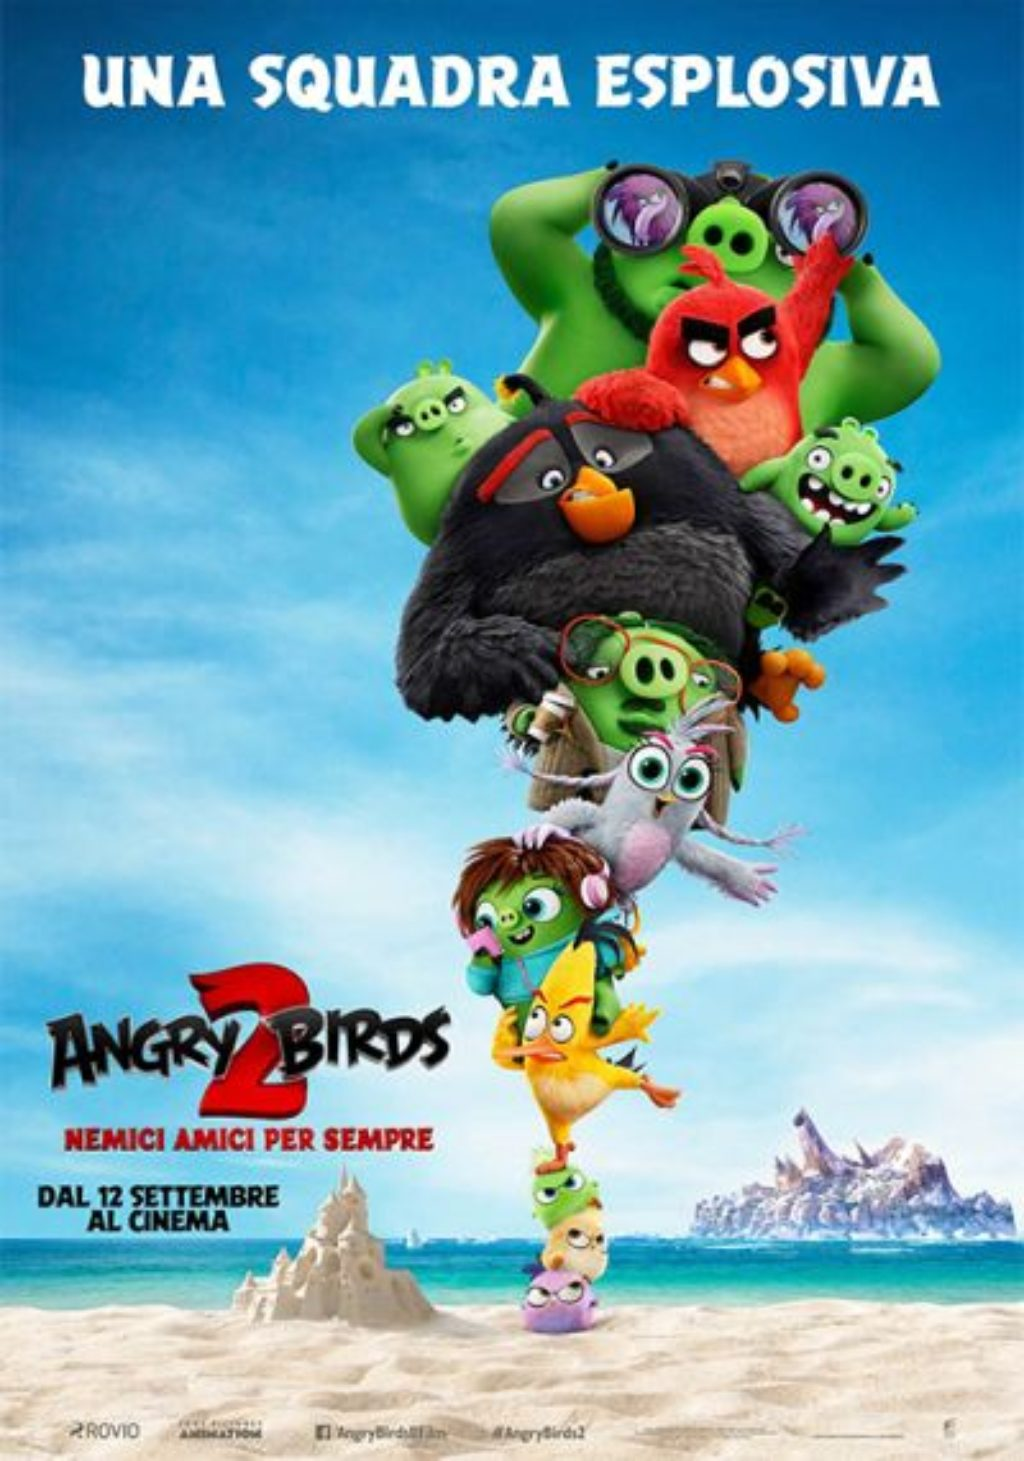 angrybirds2_big